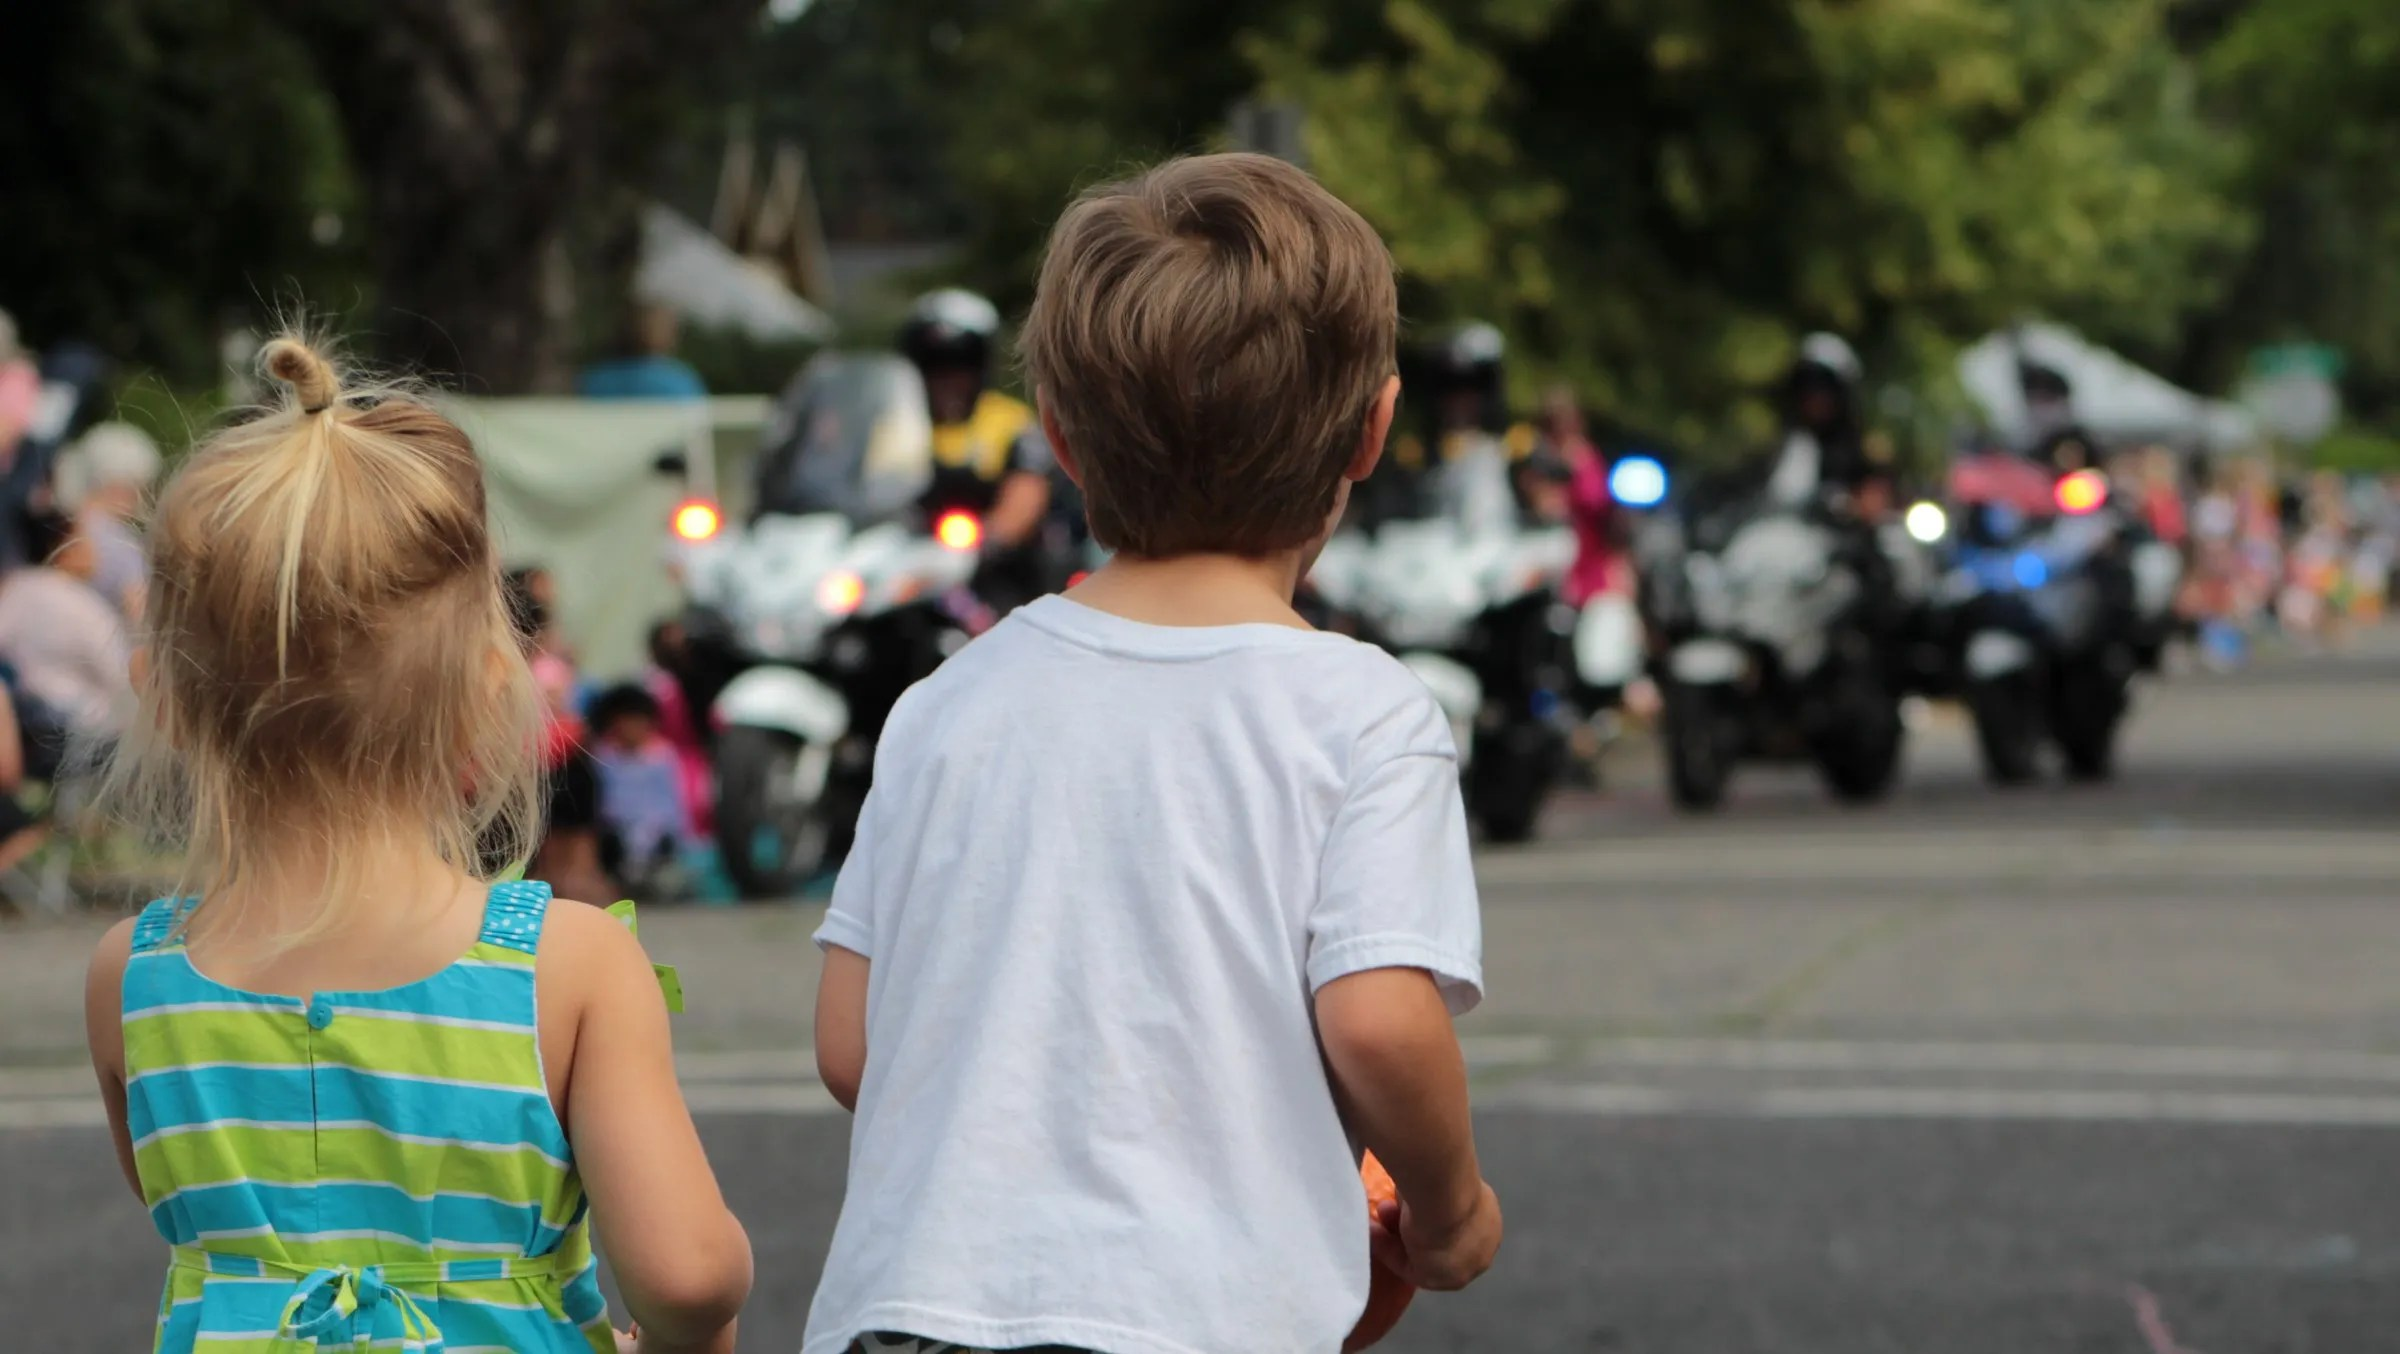 Watching the parade begin